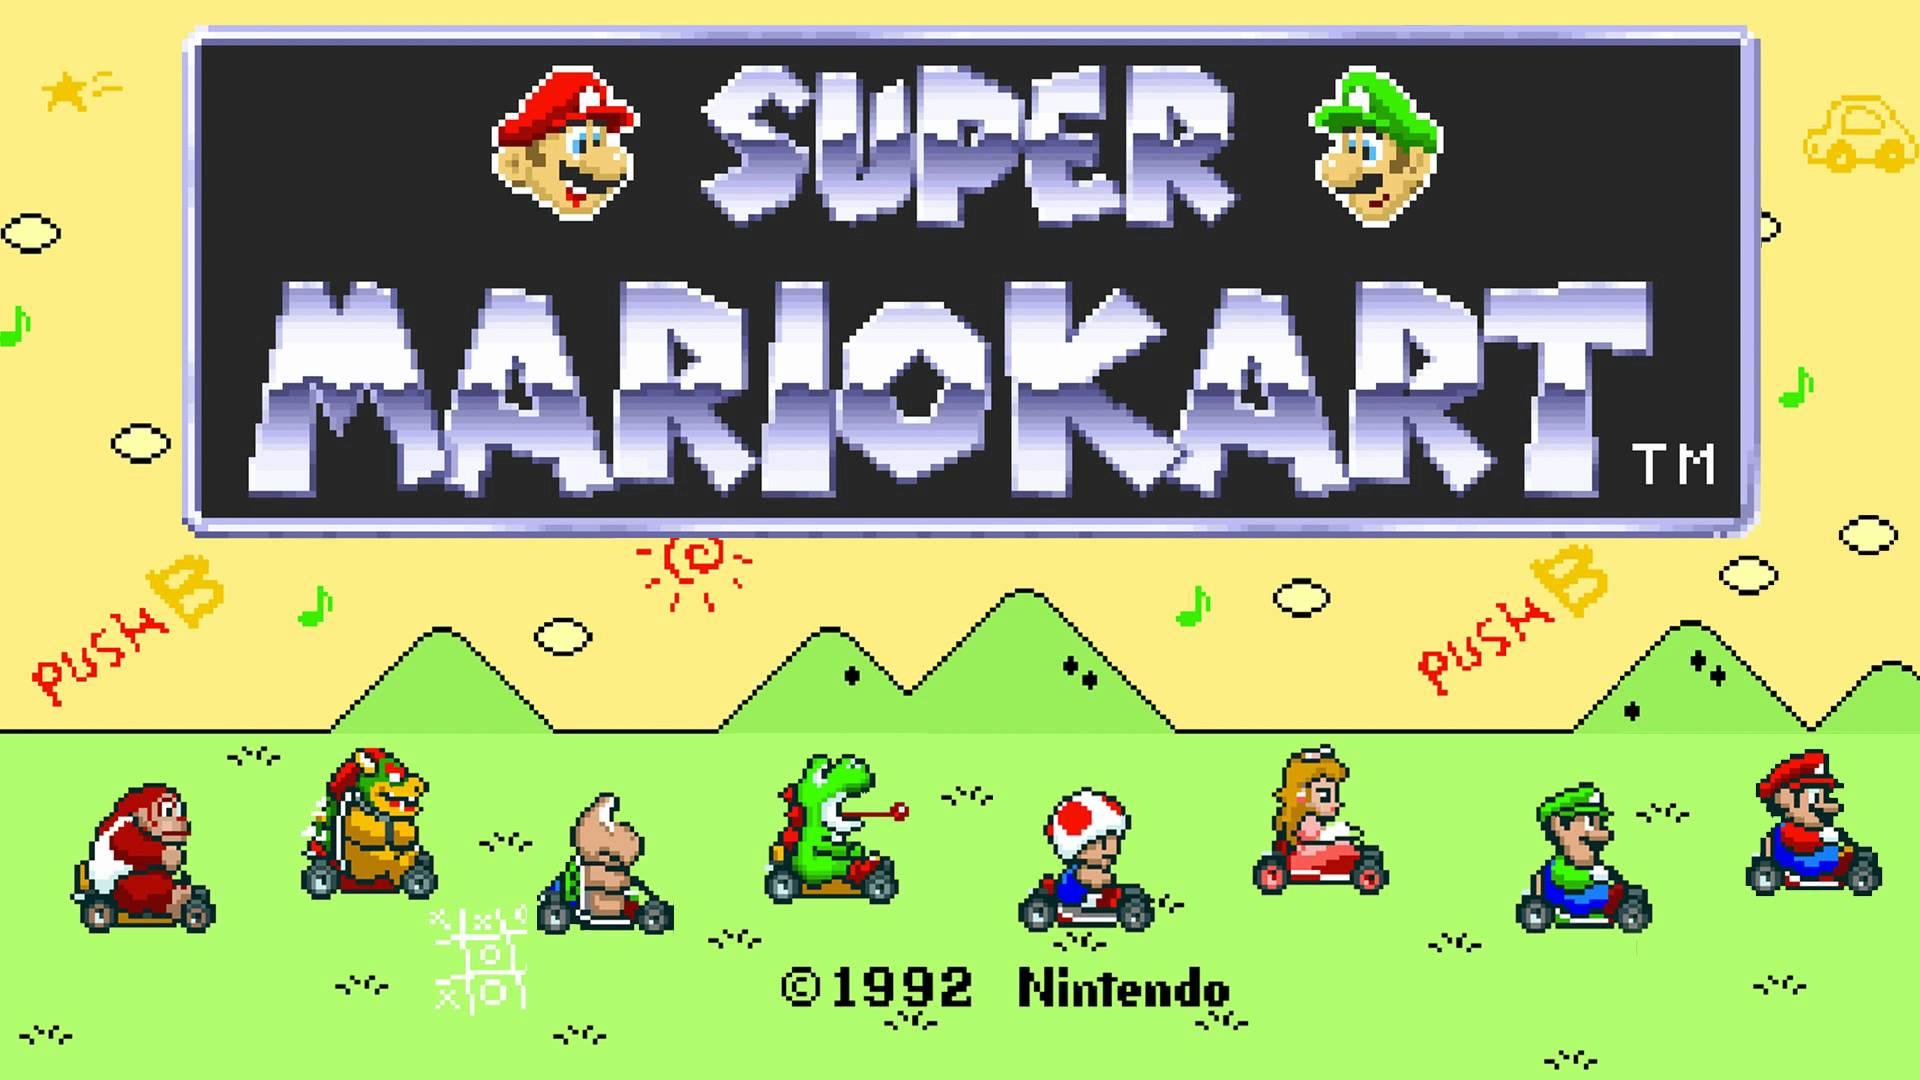 snes super nintendo classic jeux games geek nerd gamer